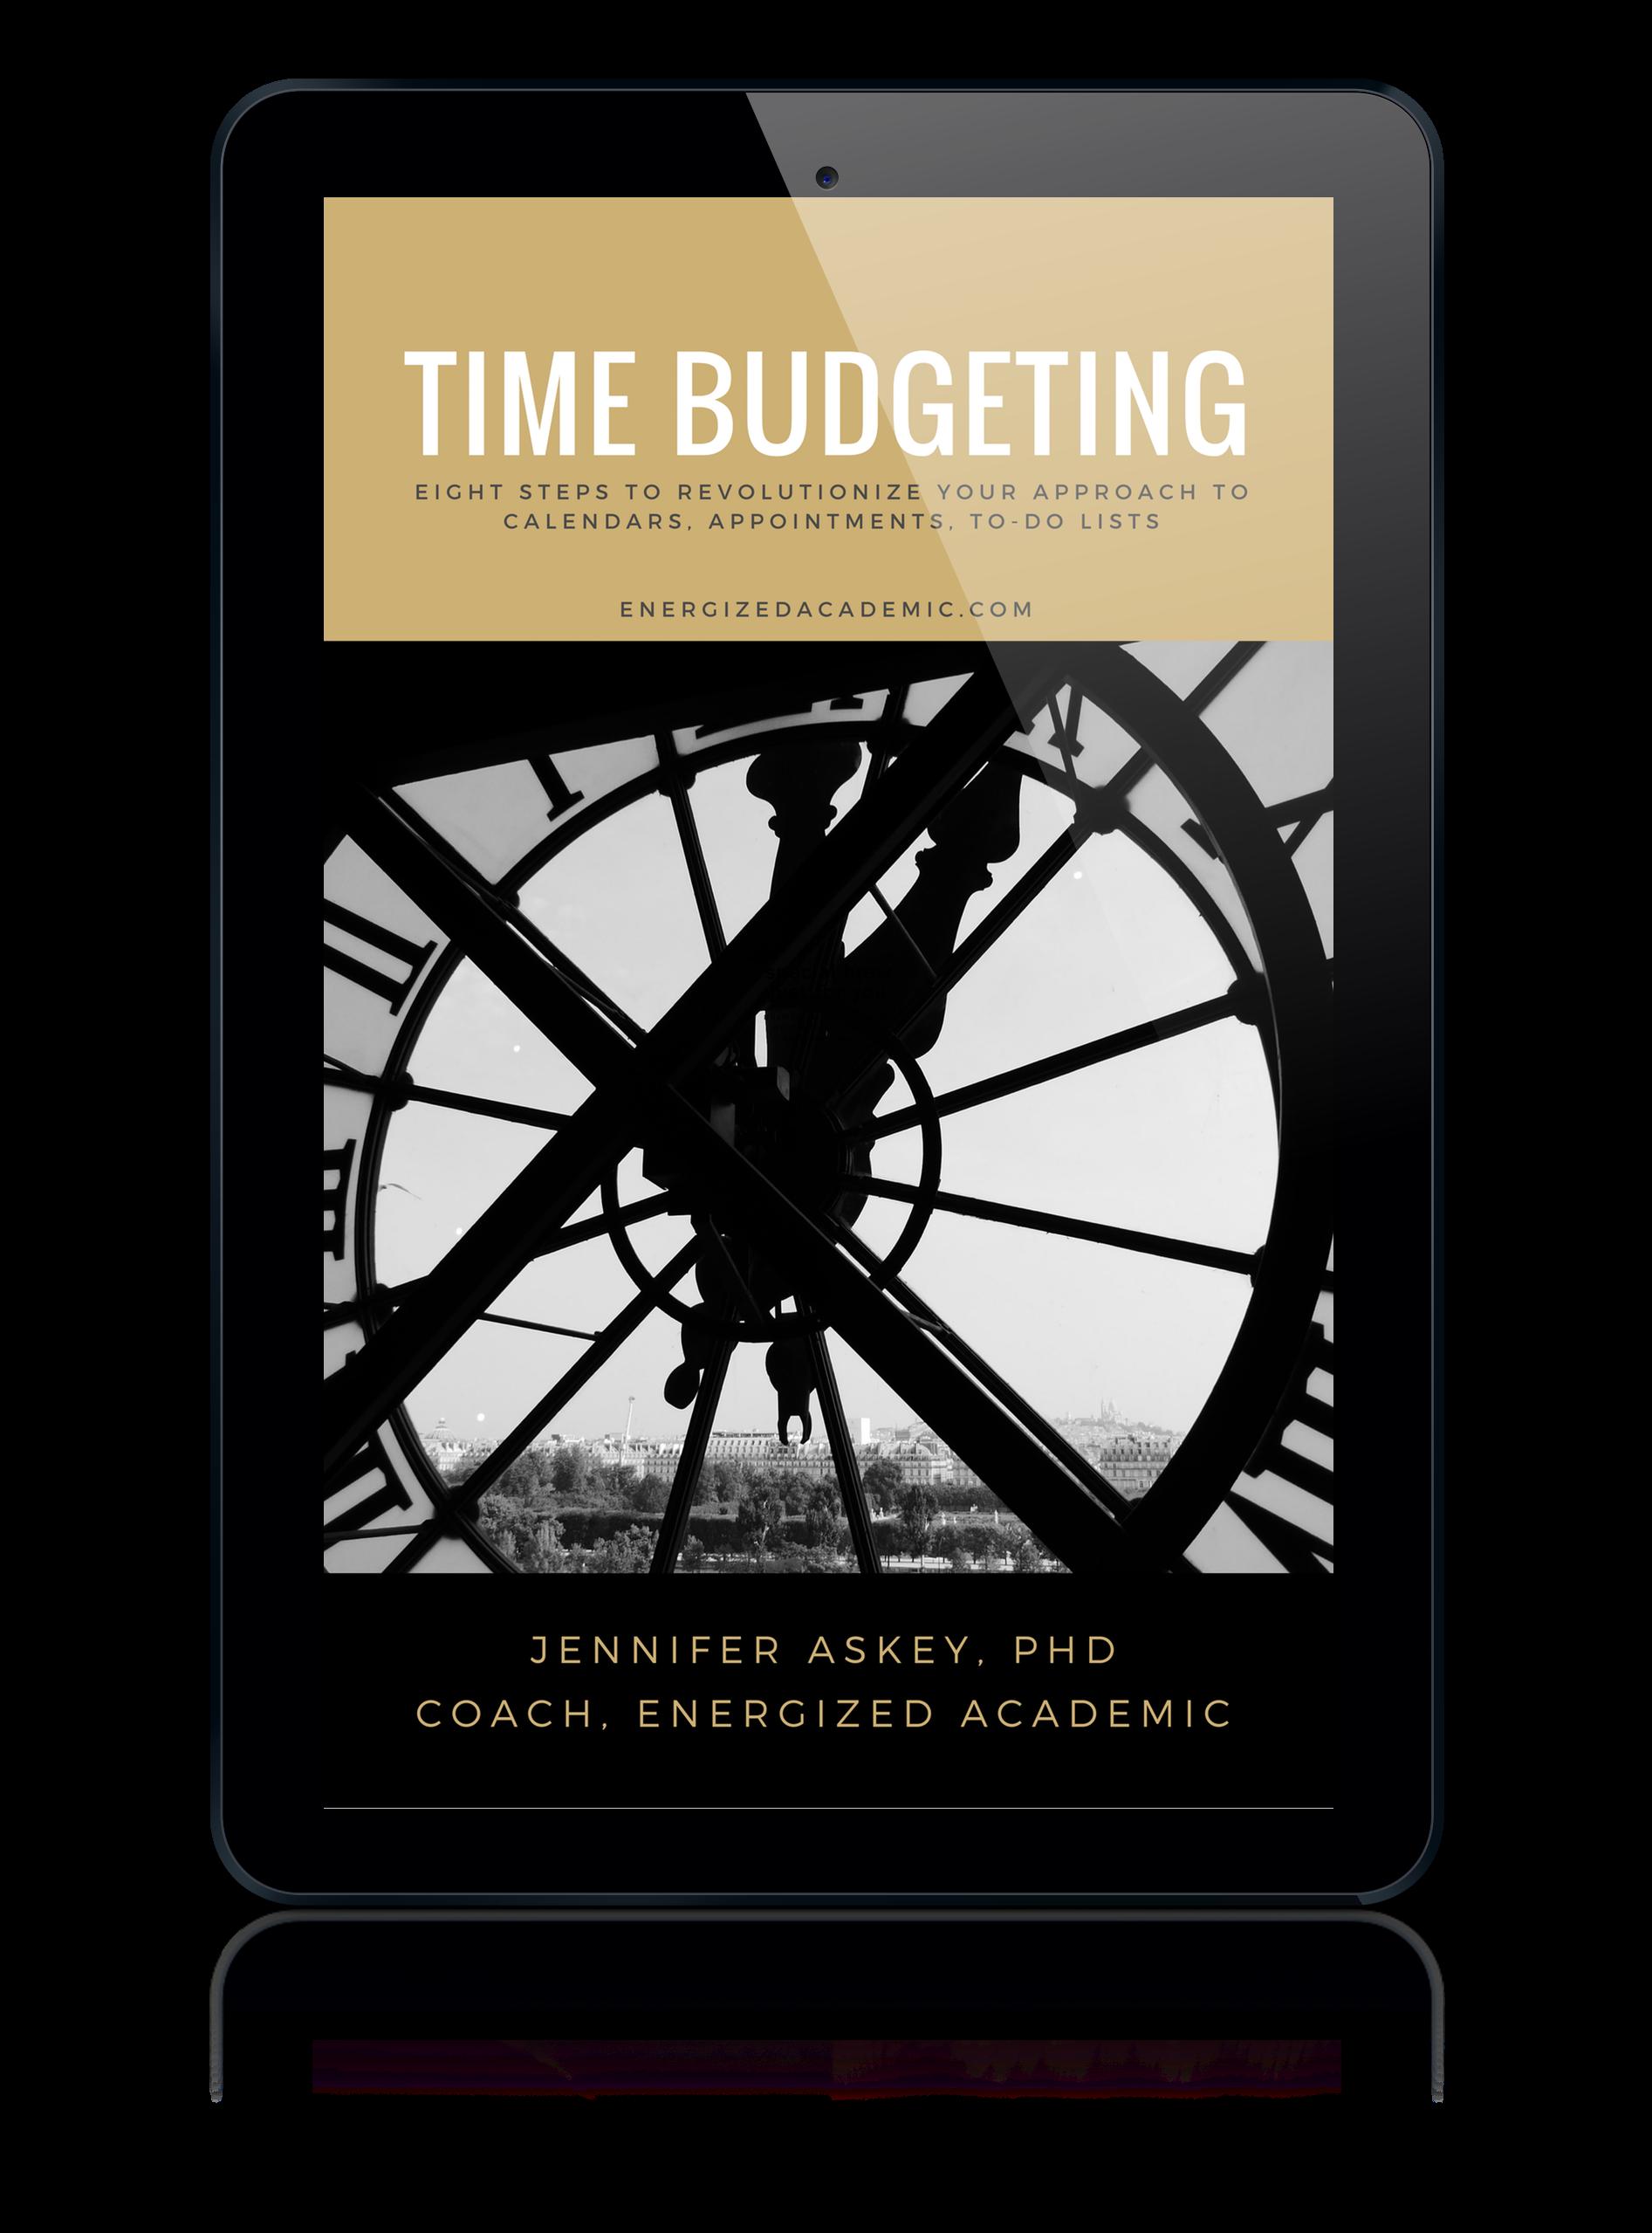 TimeBudgetingiPad.png